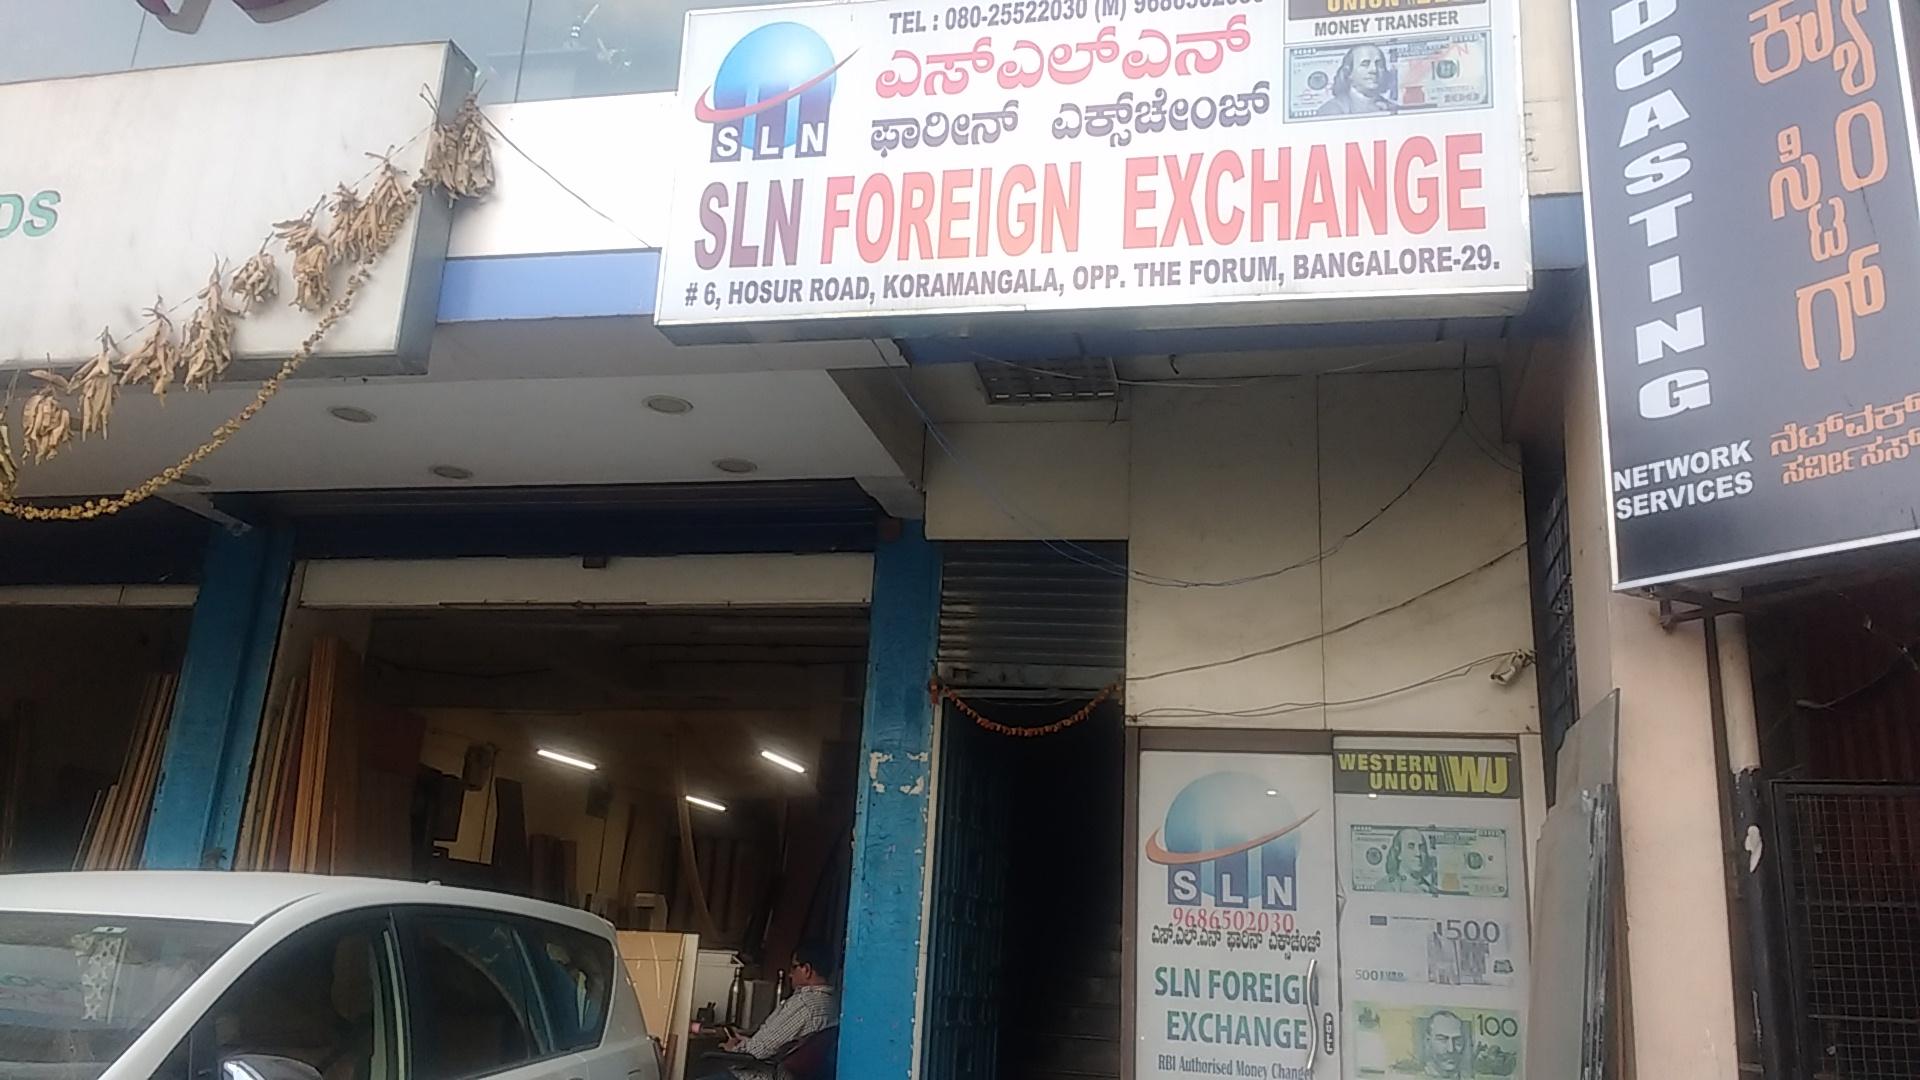 Best Foreign Exchange | Buy Travel Cards in Bangalore – Koramangala